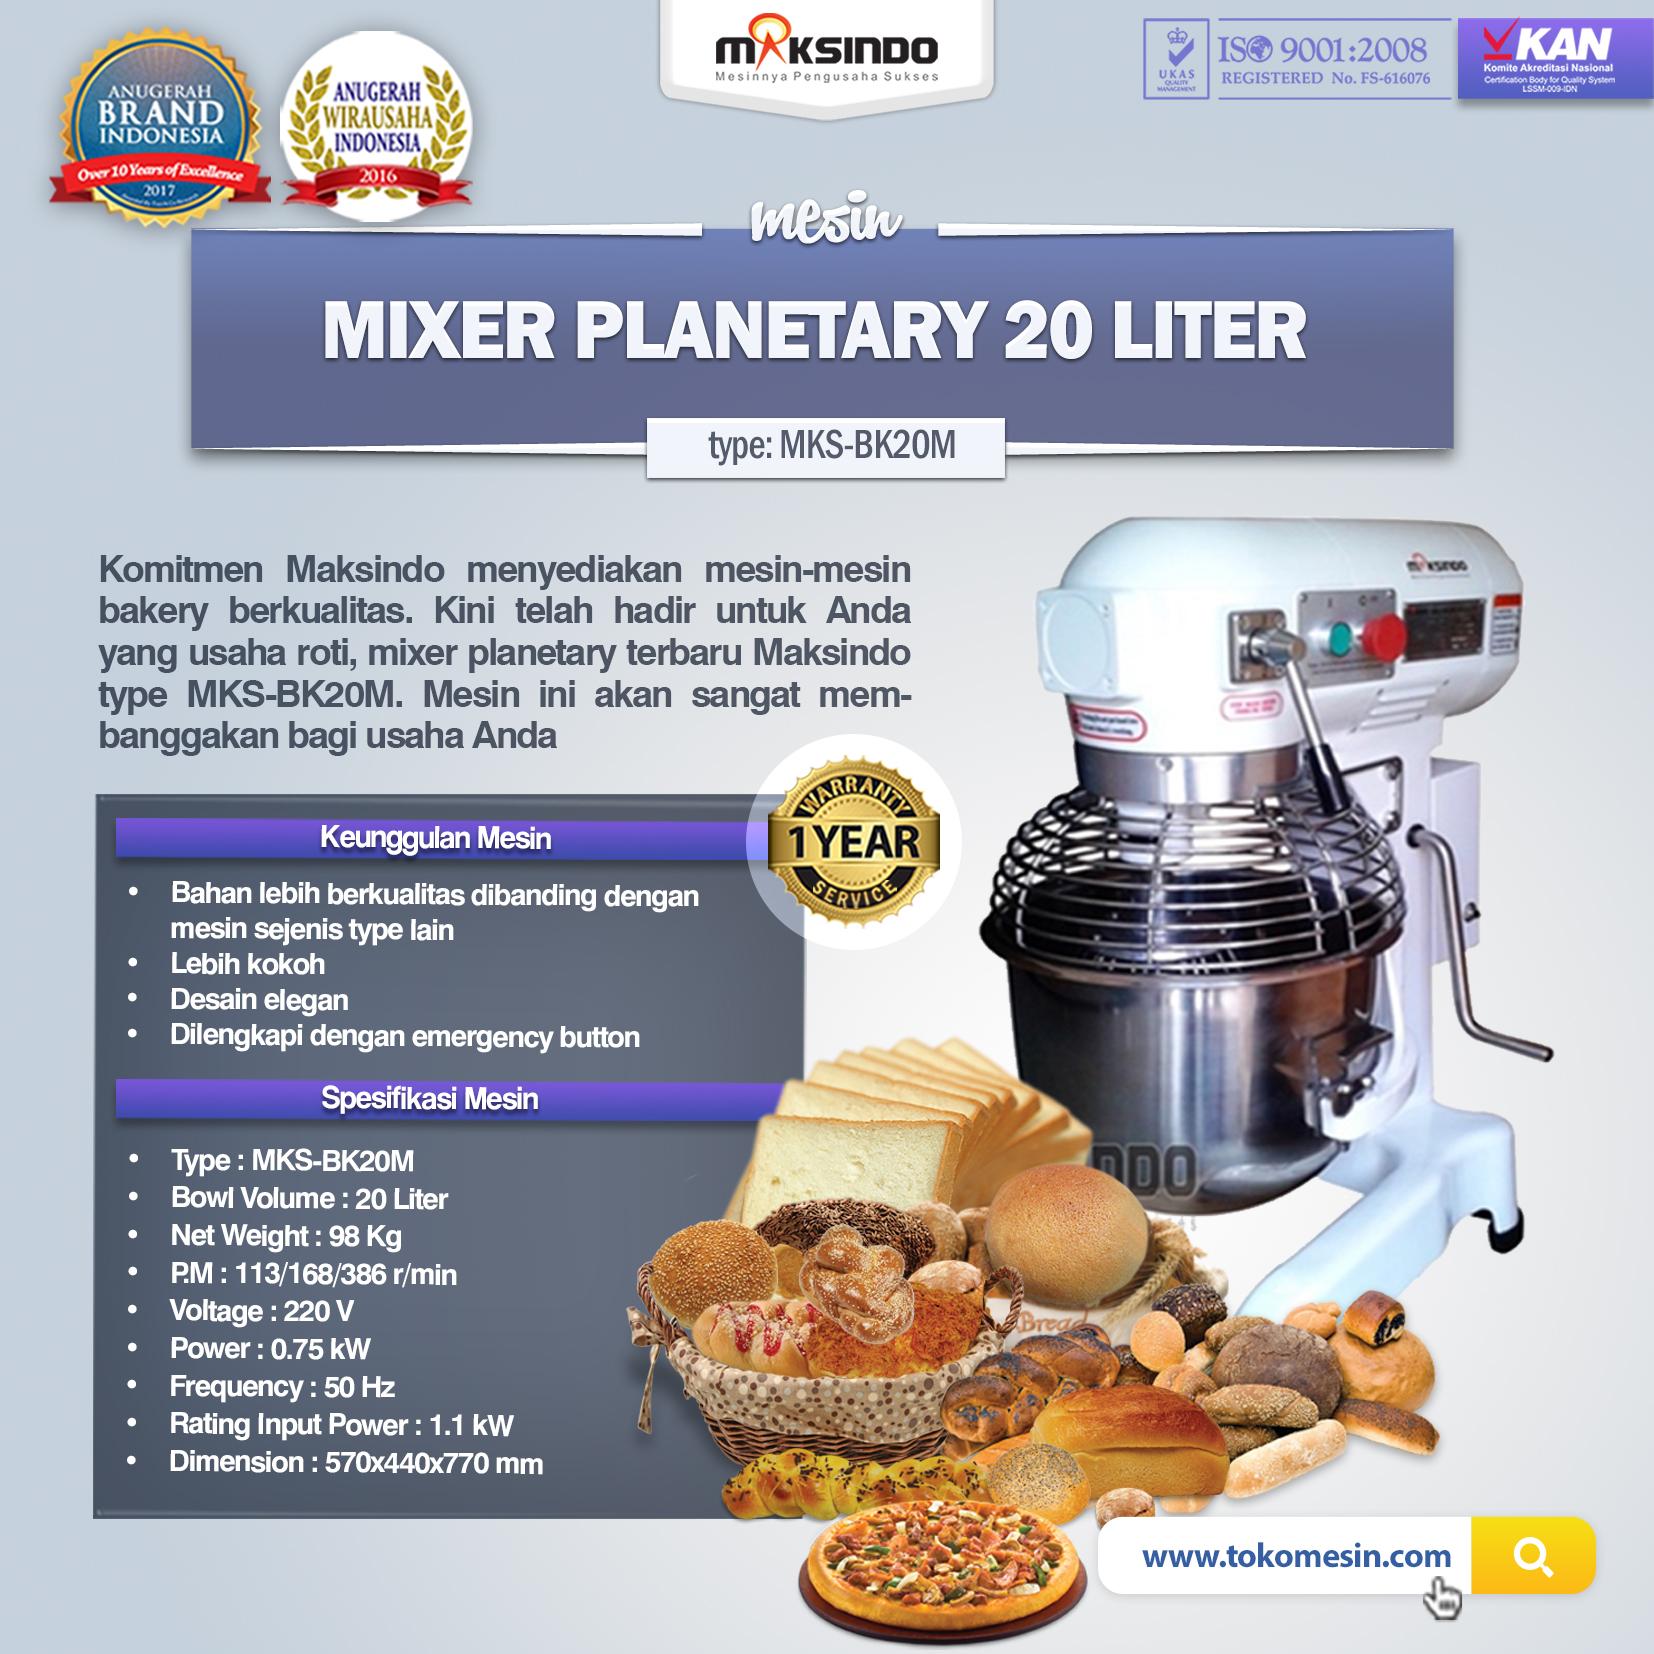 Mesin Mixer Planetary 20 Liter (MKS-BK20M)(1)